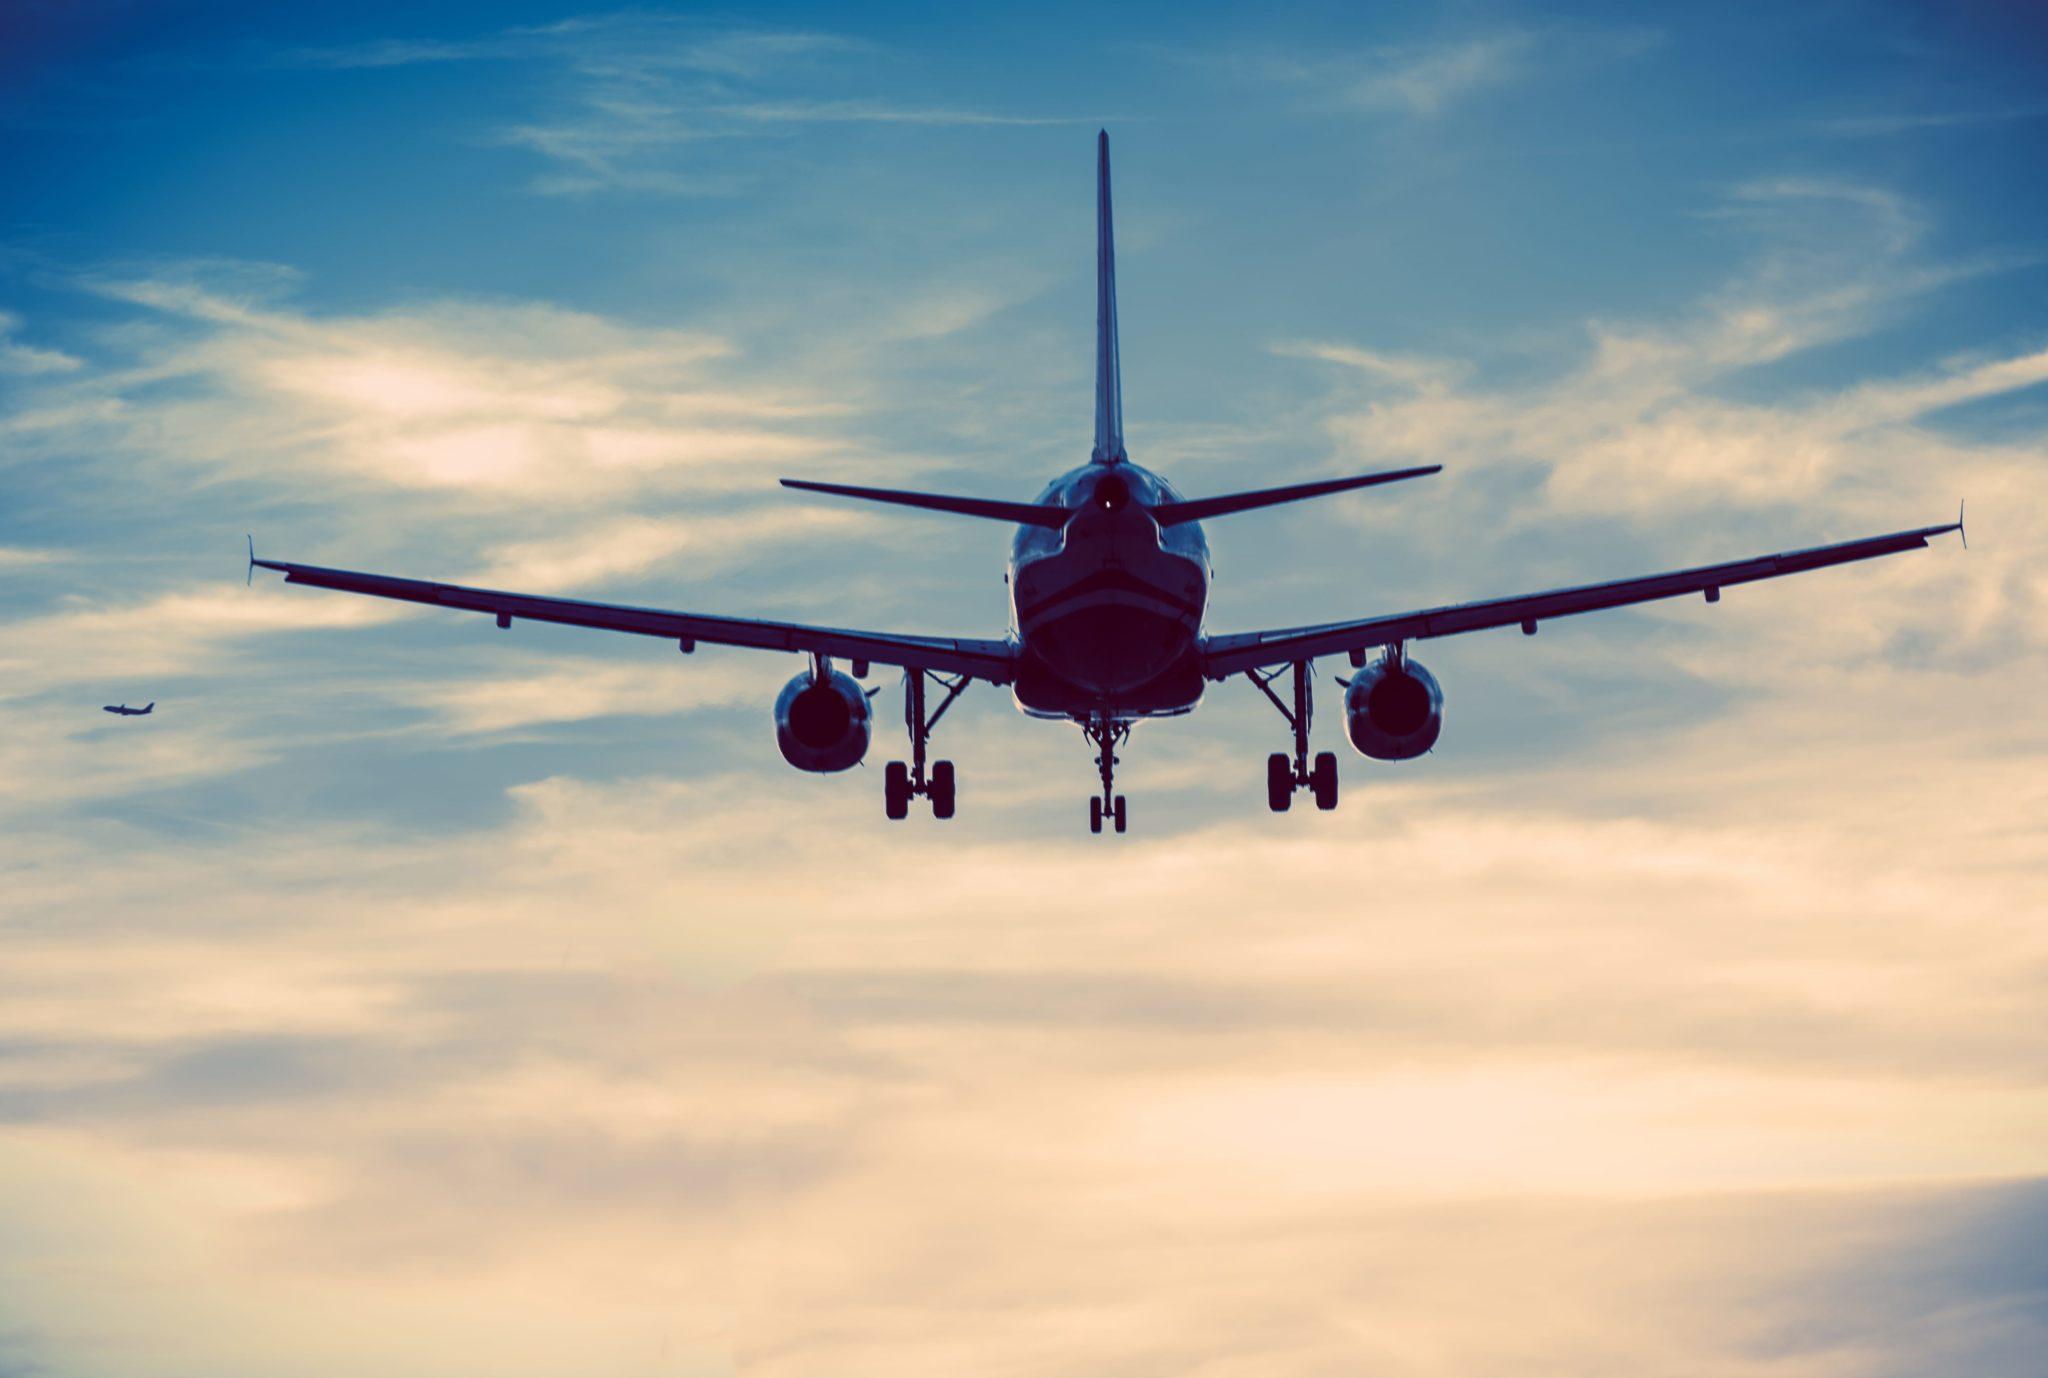 avion decolage